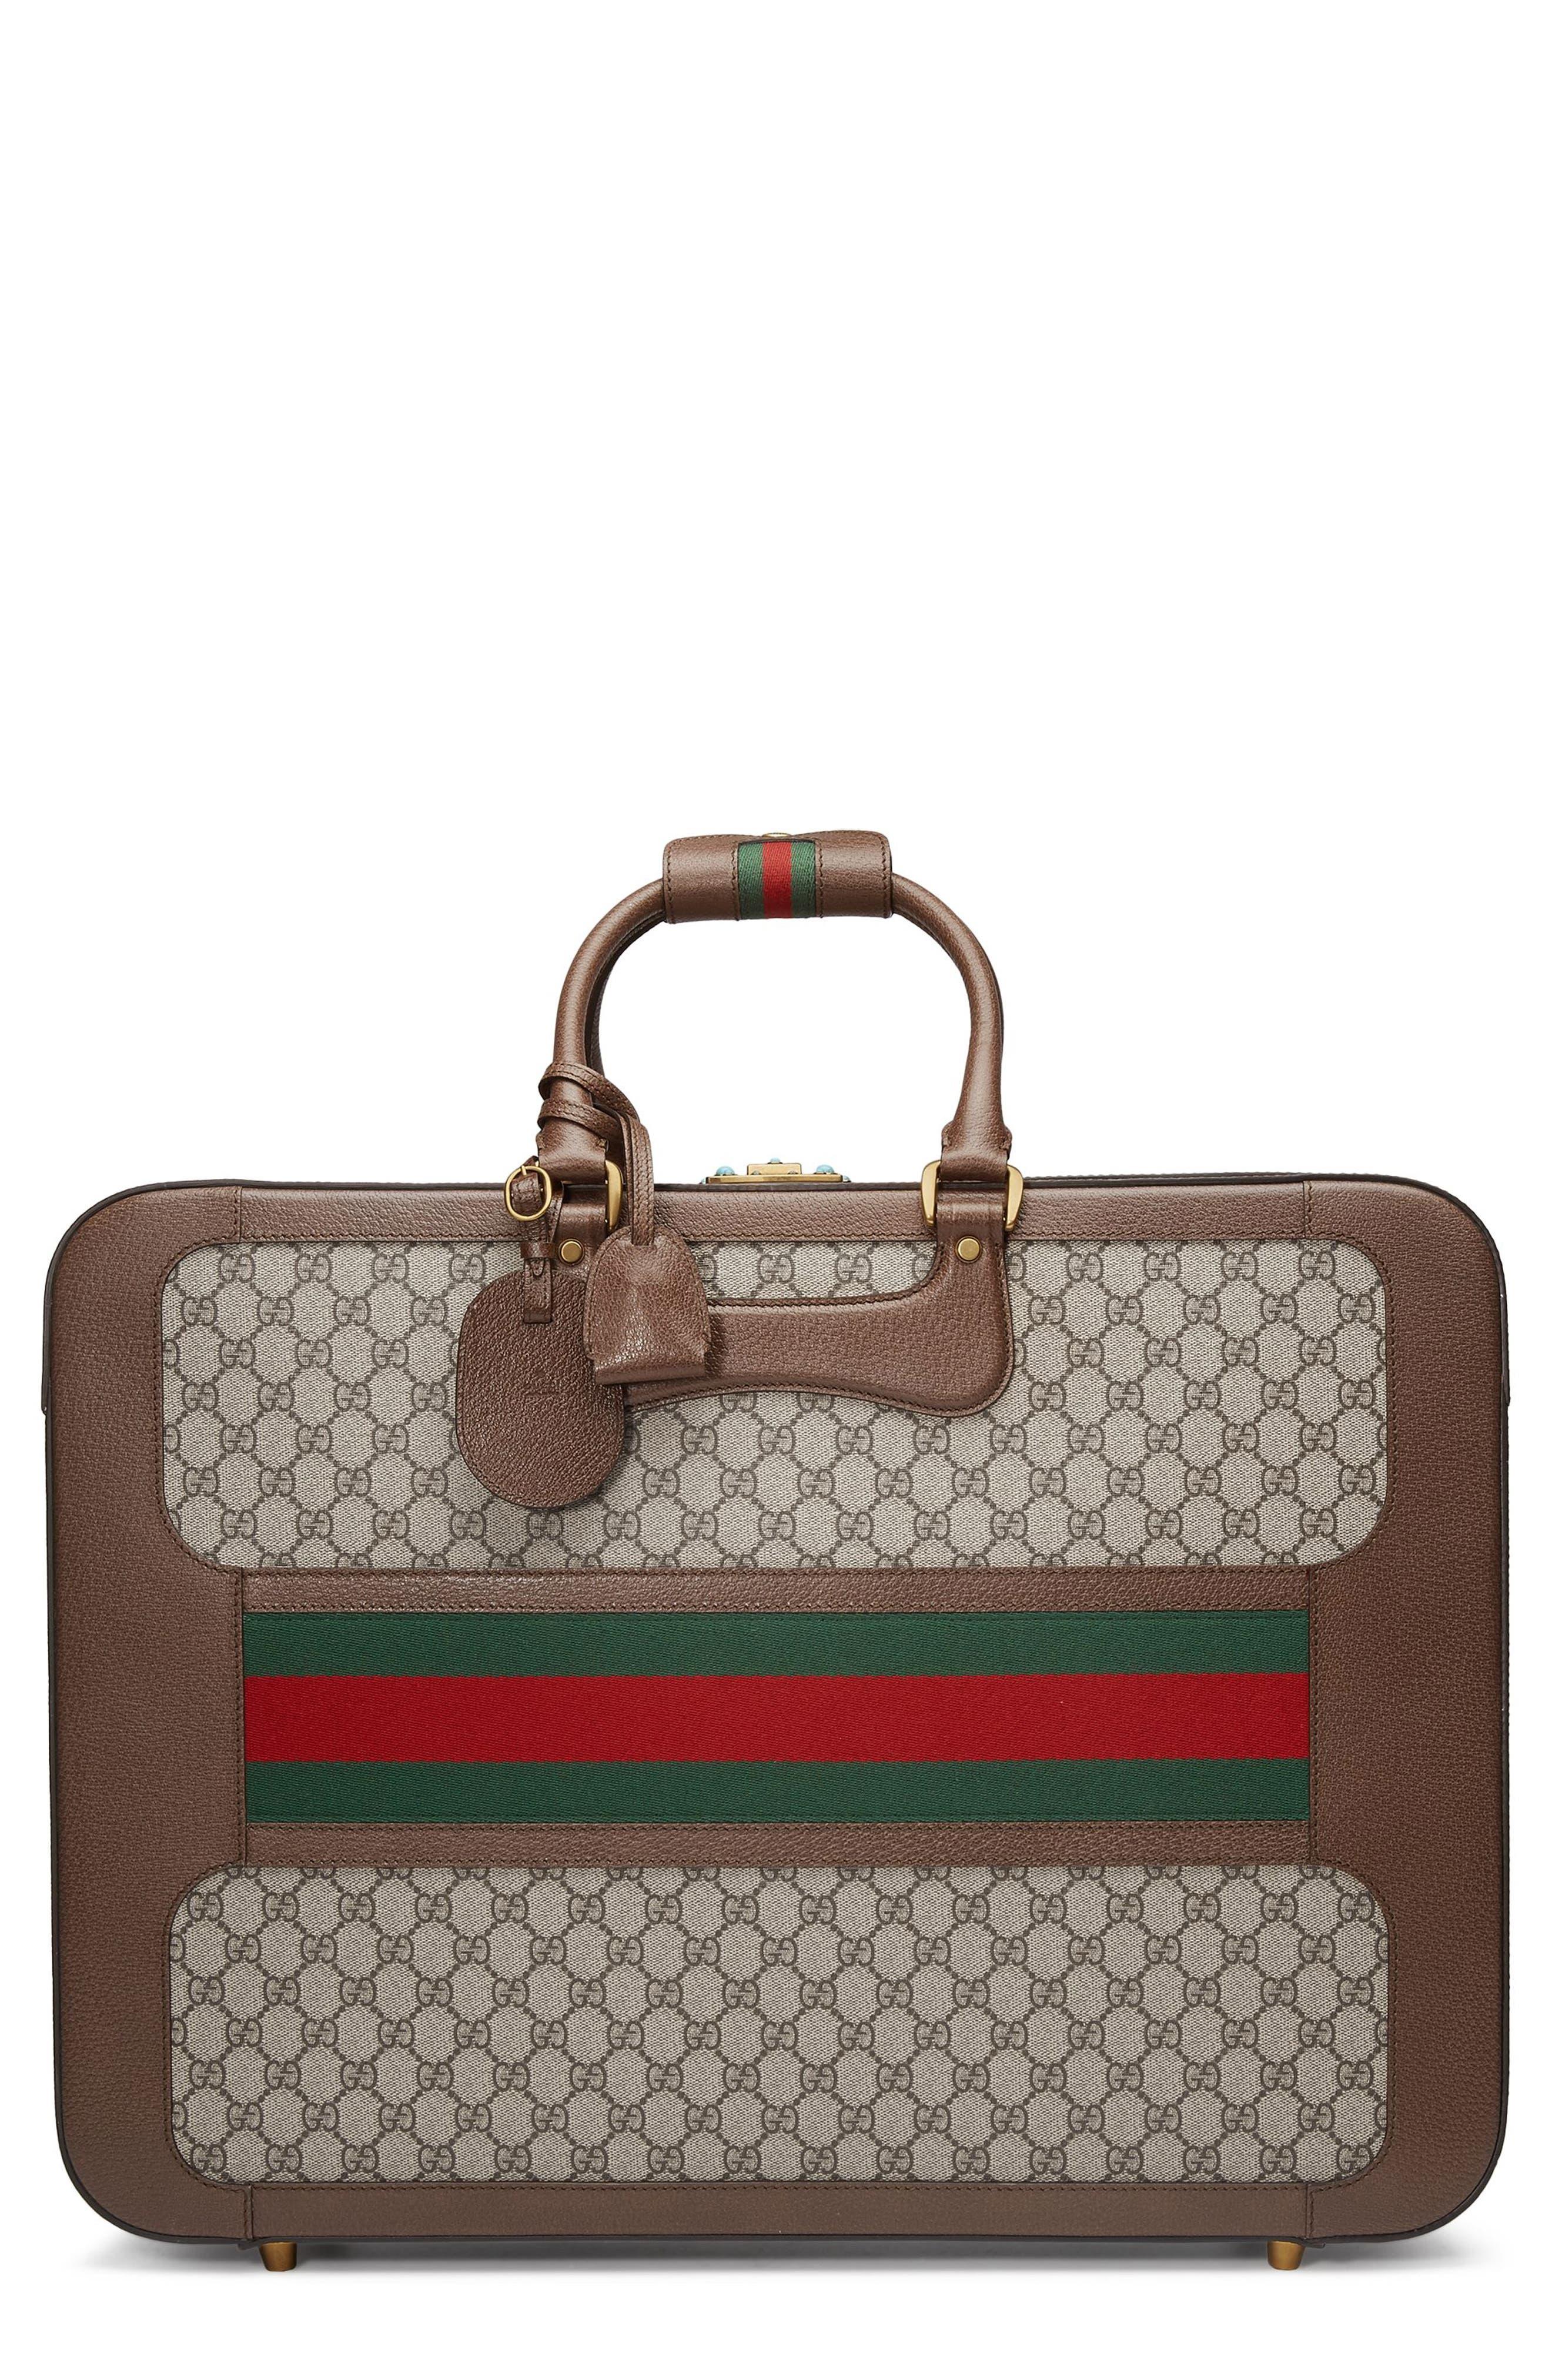 Large Echo GG Supreme Canvas & Leather Suitcase,                             Main thumbnail 1, color,                             Beige/ Ebony